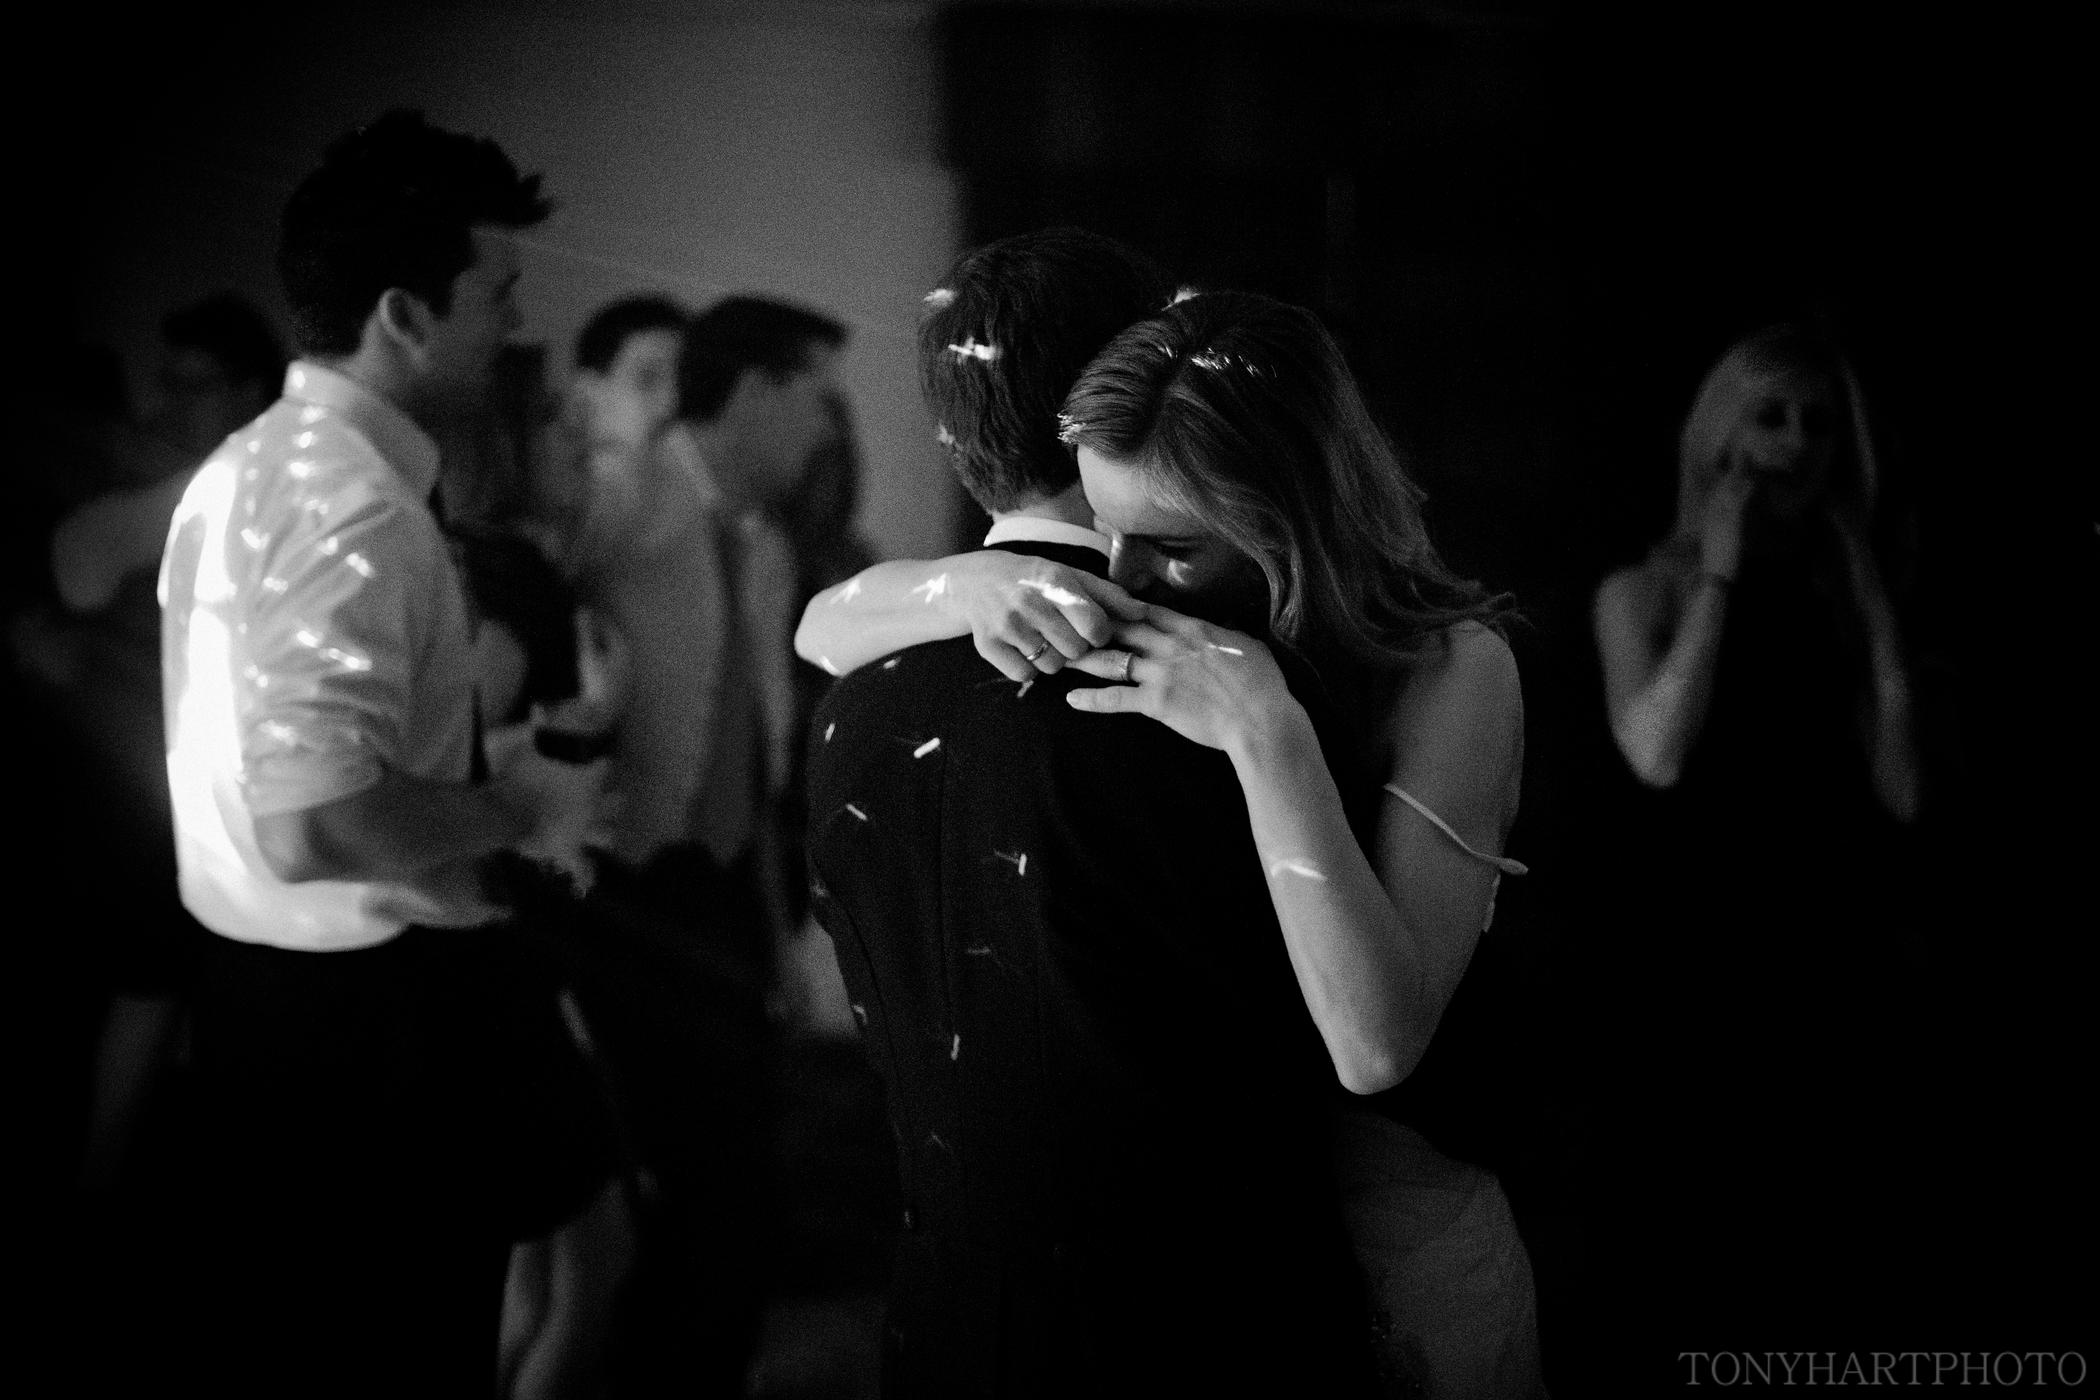 Justyna & Tom on the dancefloor at Frimley Hall Hotel - Romantic Wedding Photos